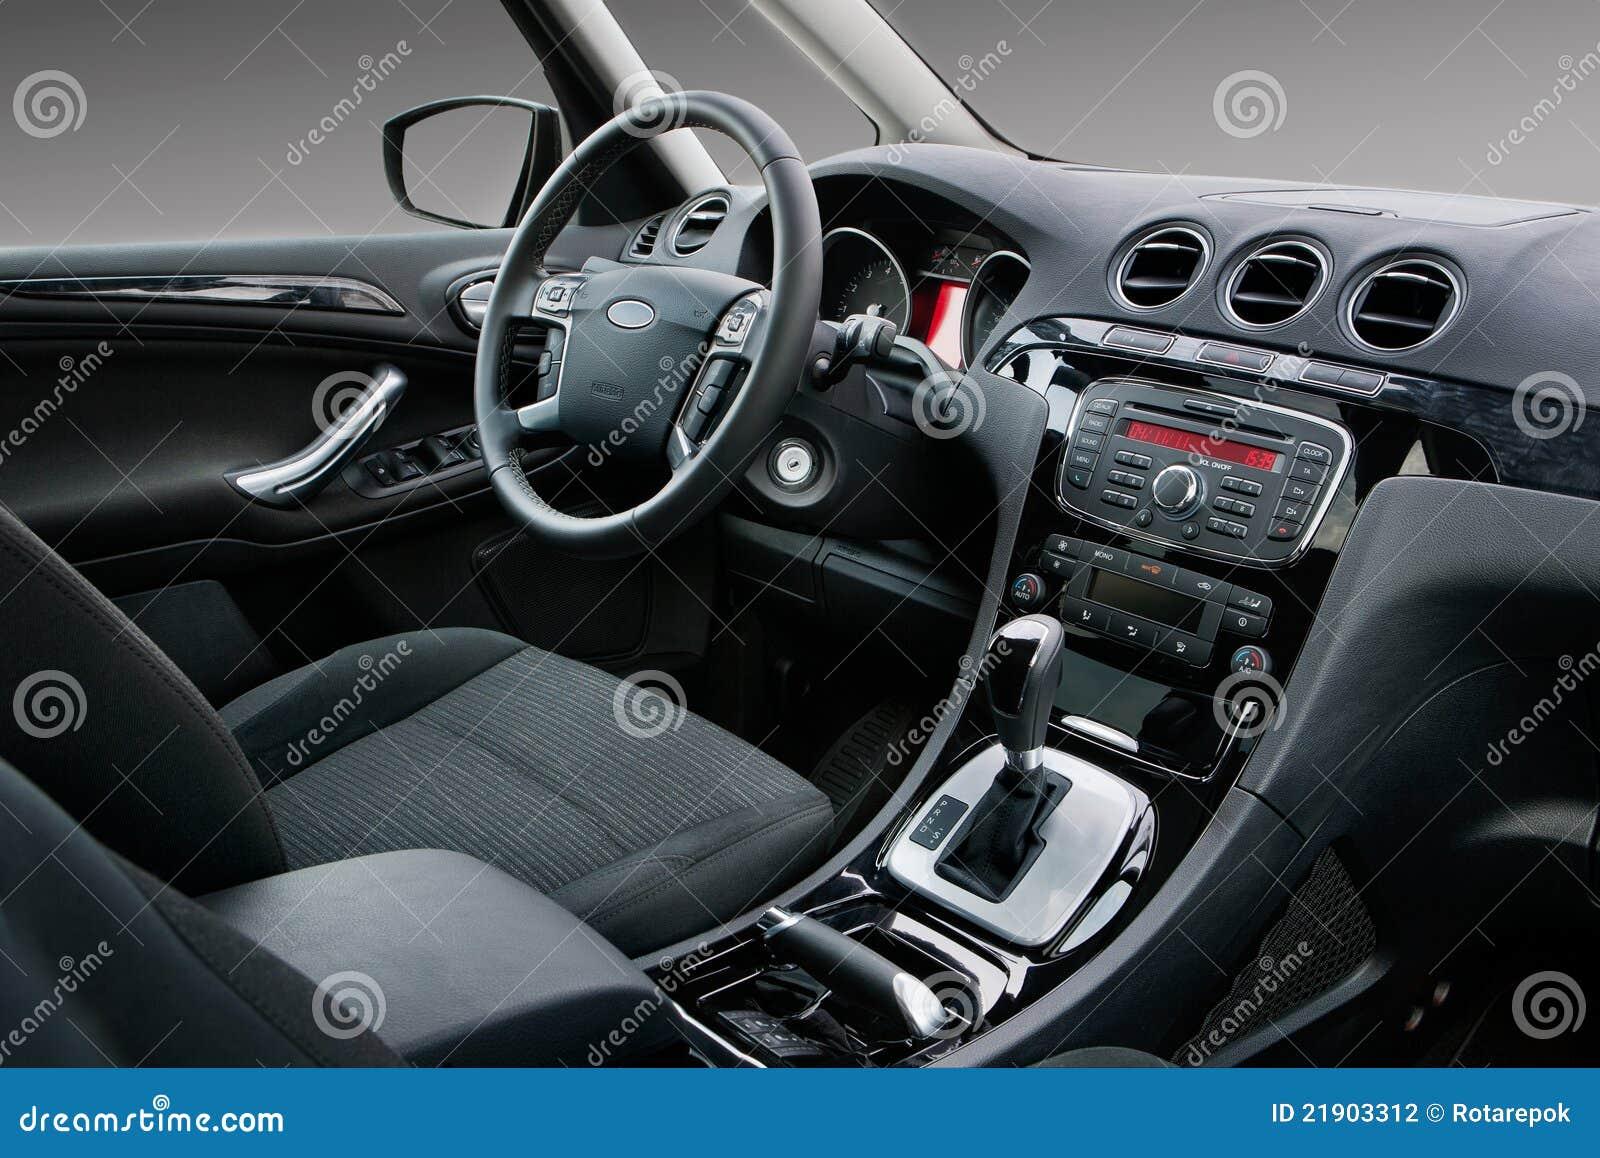 modern car interior stock photography image 21903312. Black Bedroom Furniture Sets. Home Design Ideas